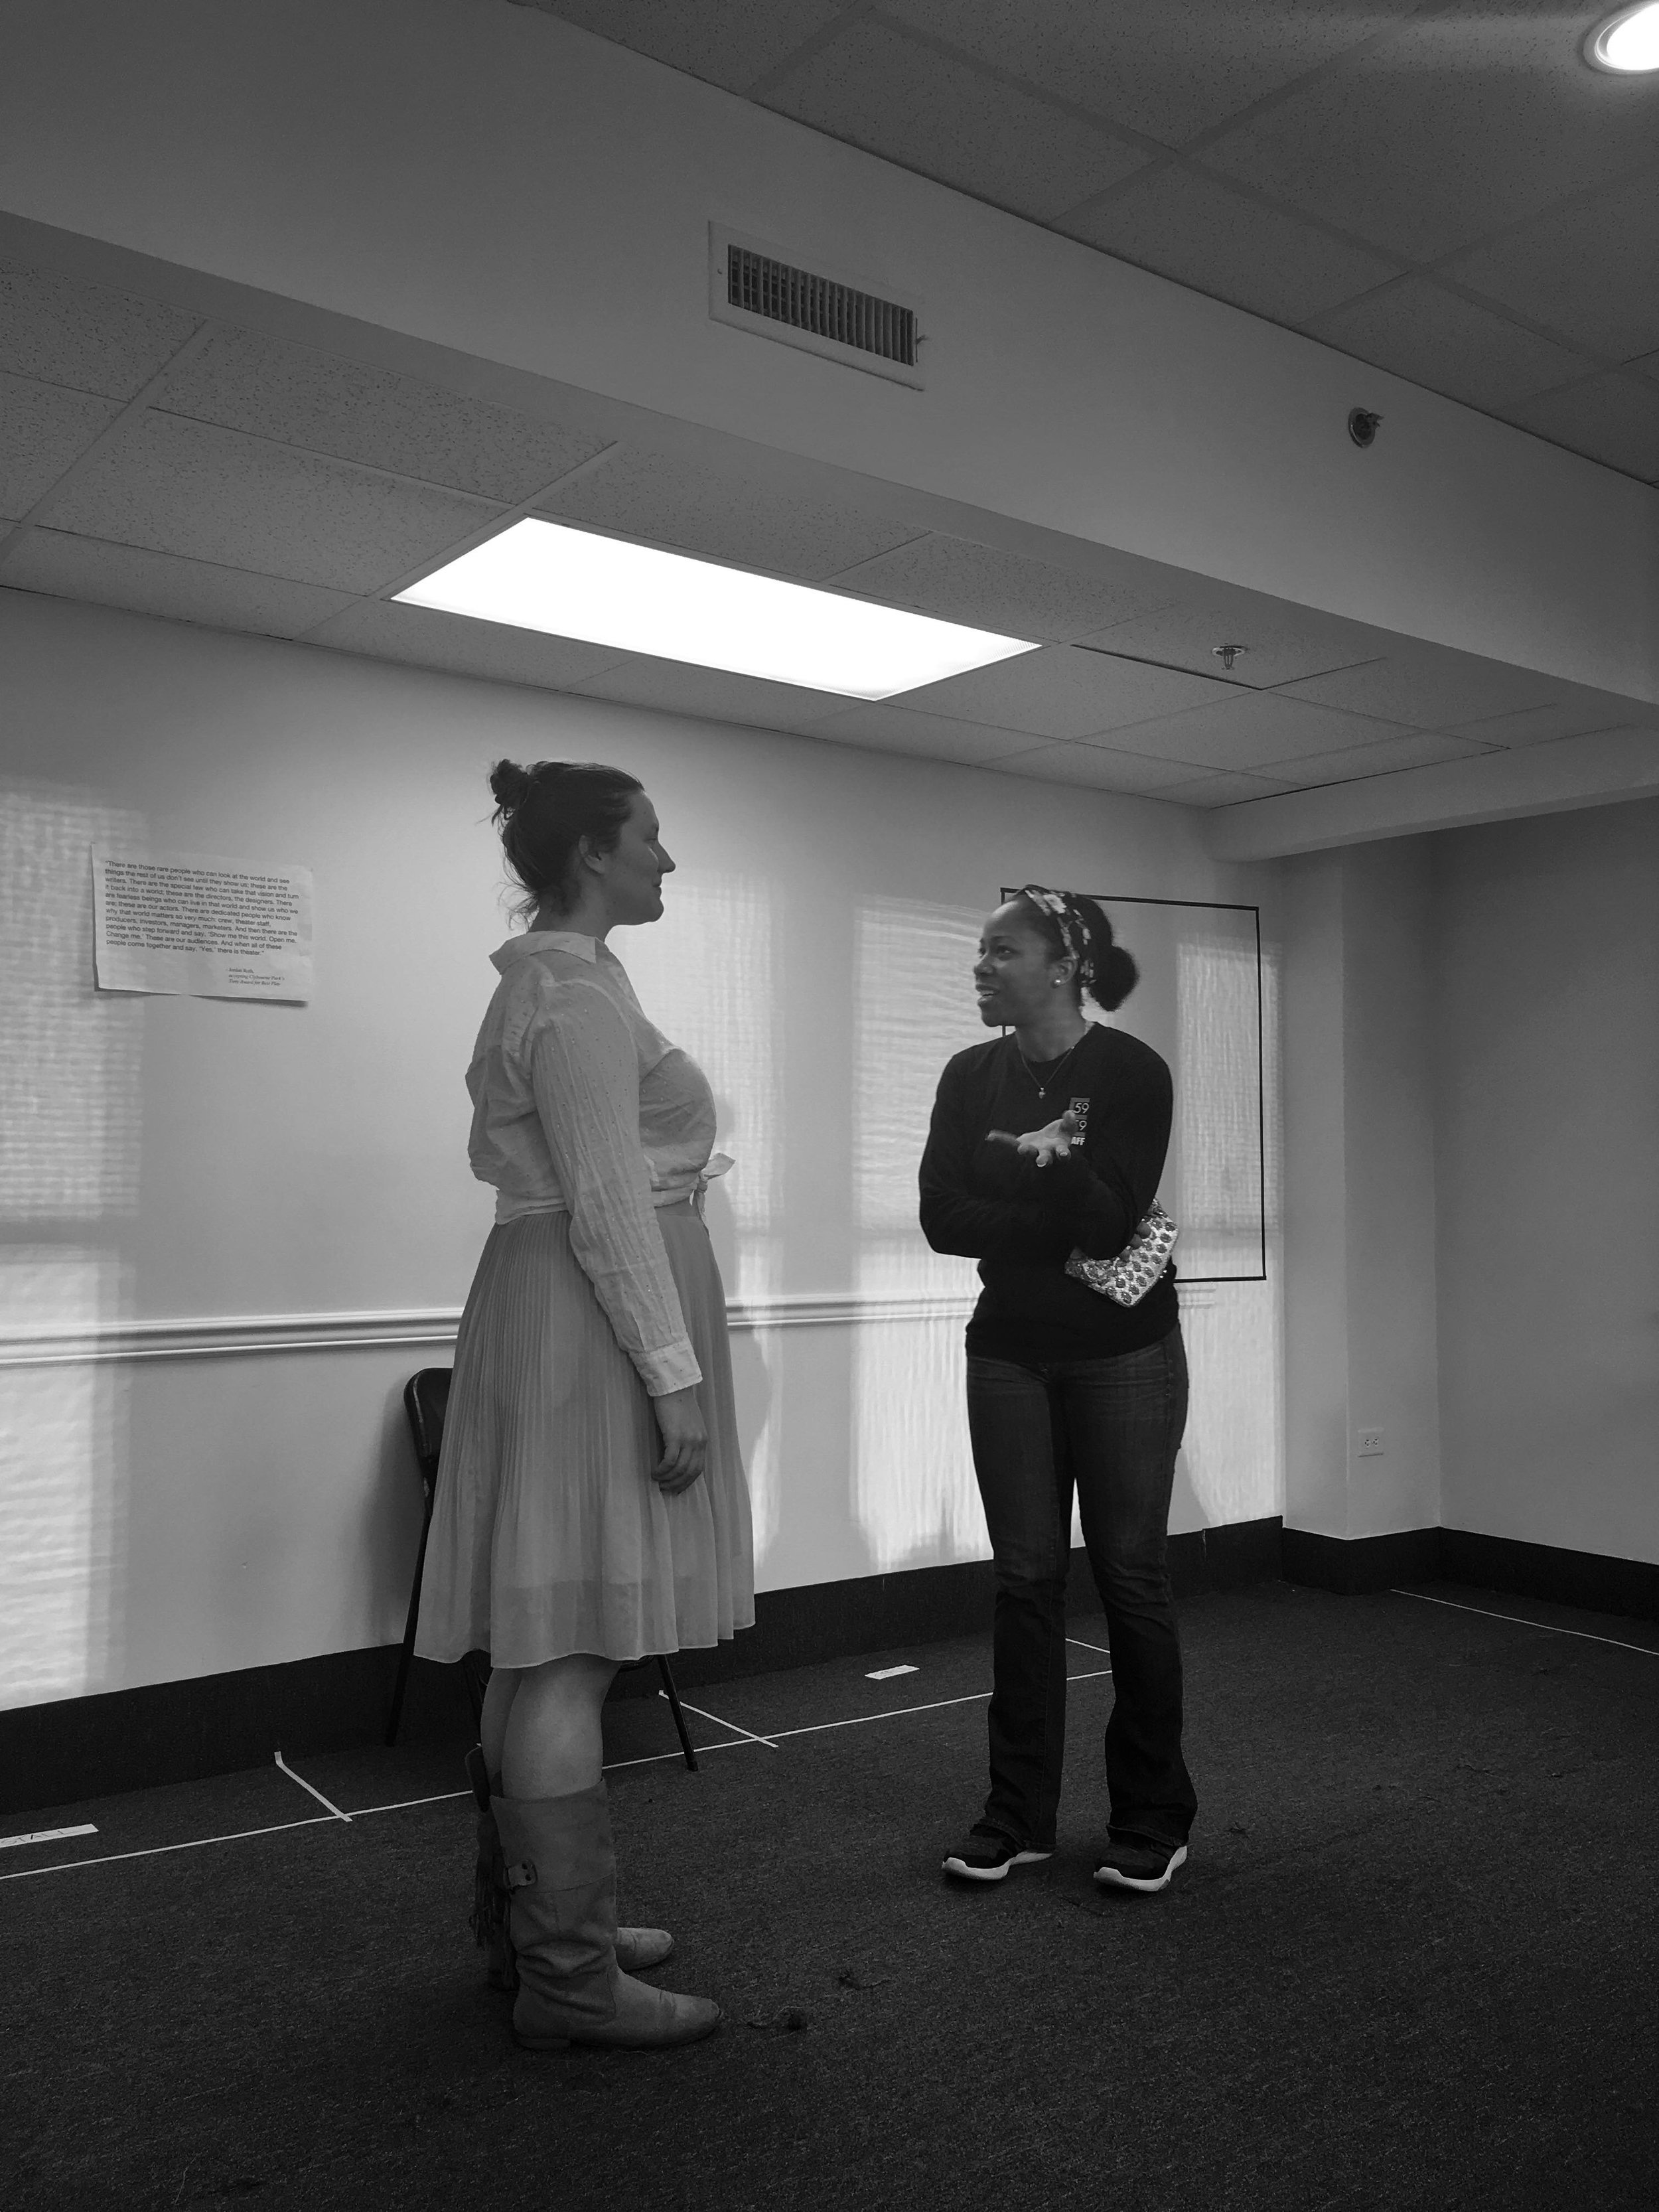 Danielle and Brandi Burgess (Holly) rehearse a scene